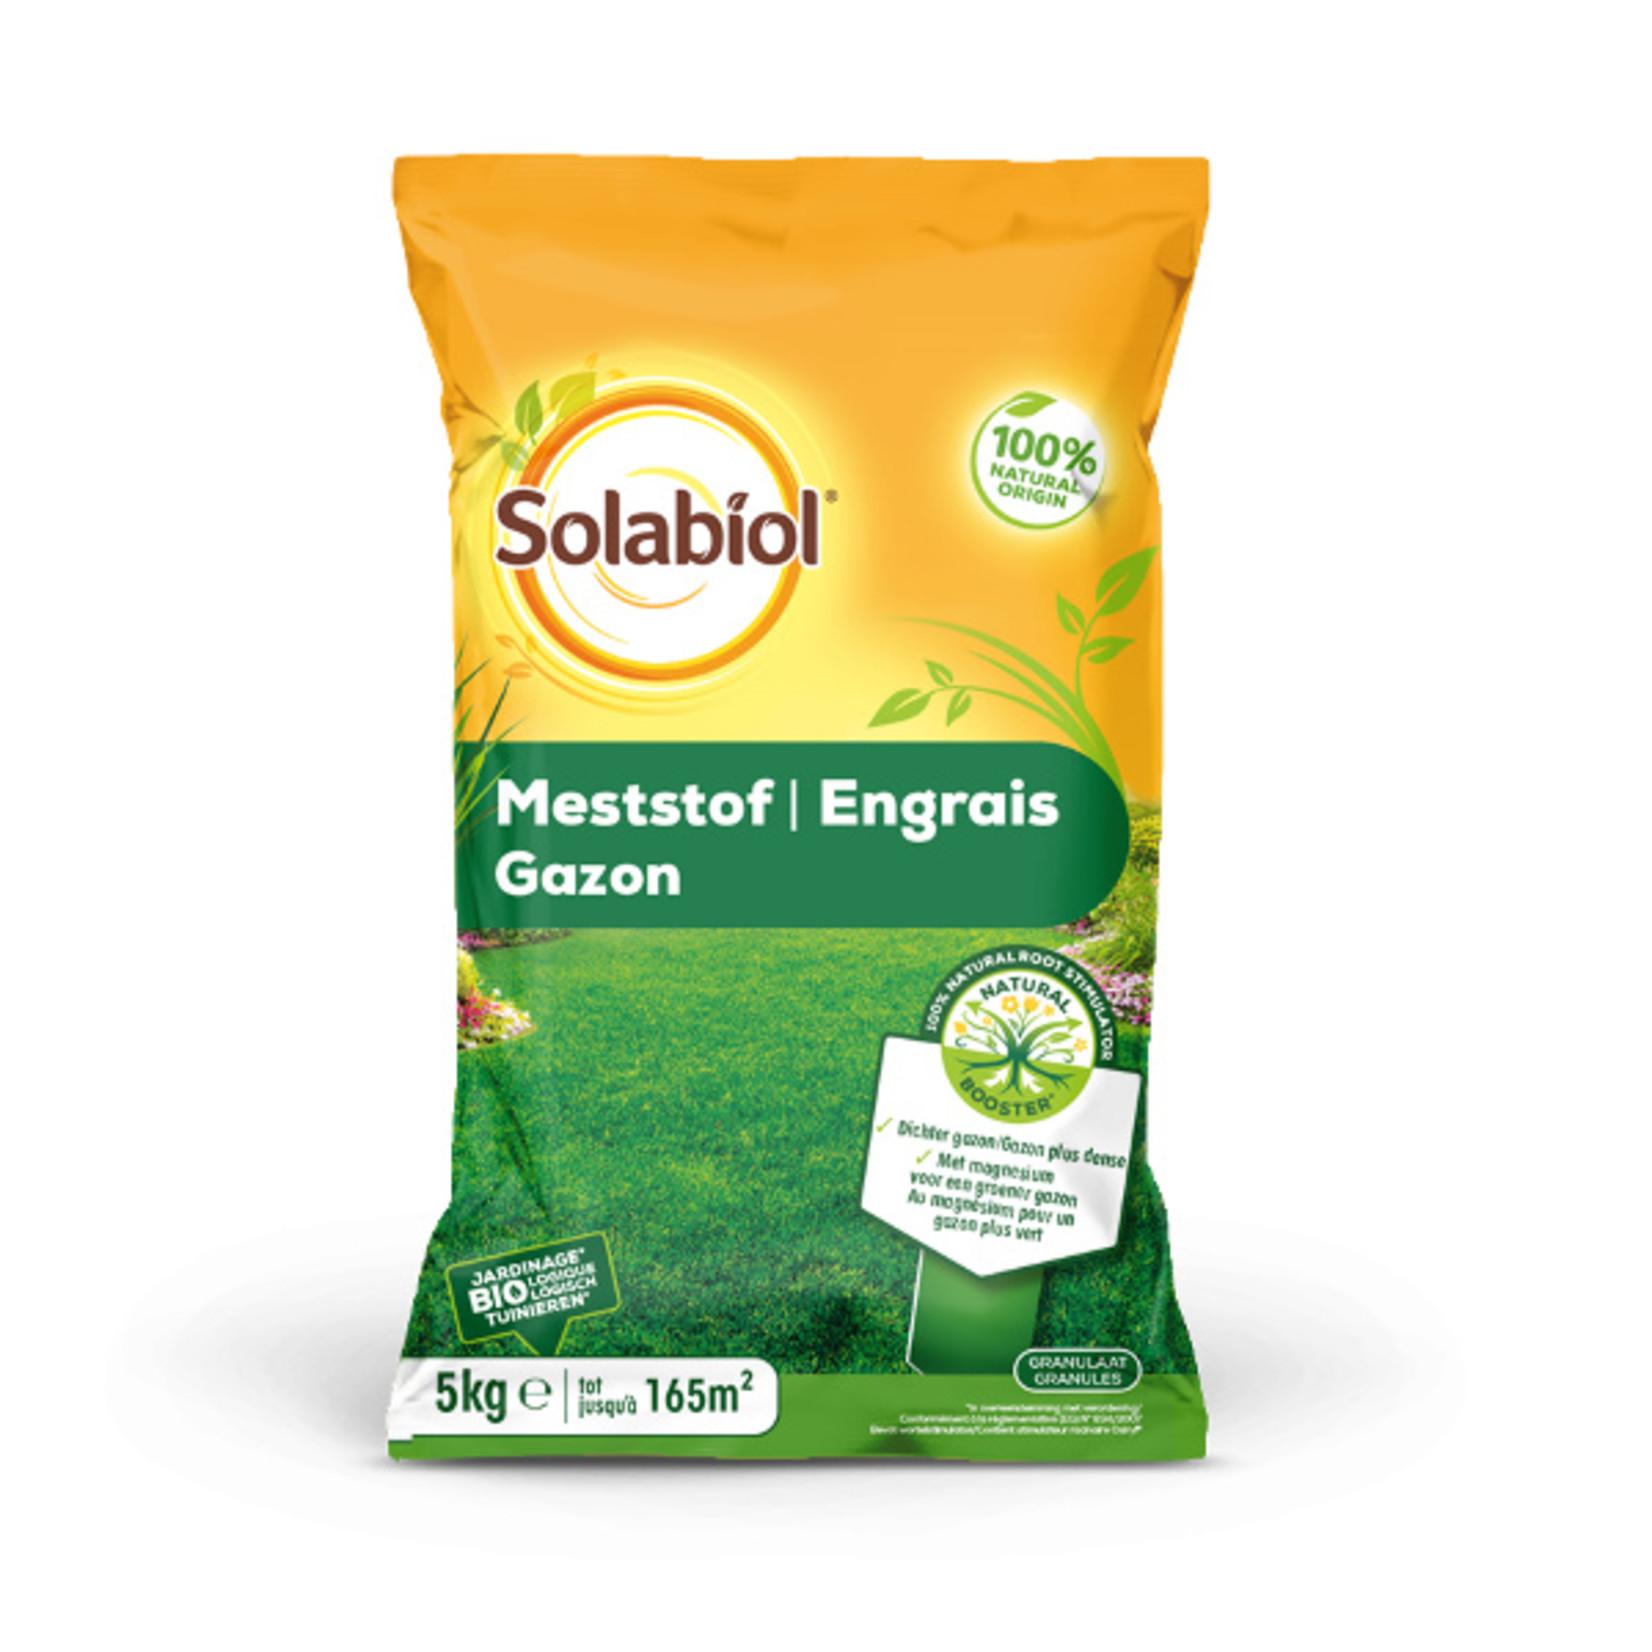 Solabiol Meststof gazon 5 kg